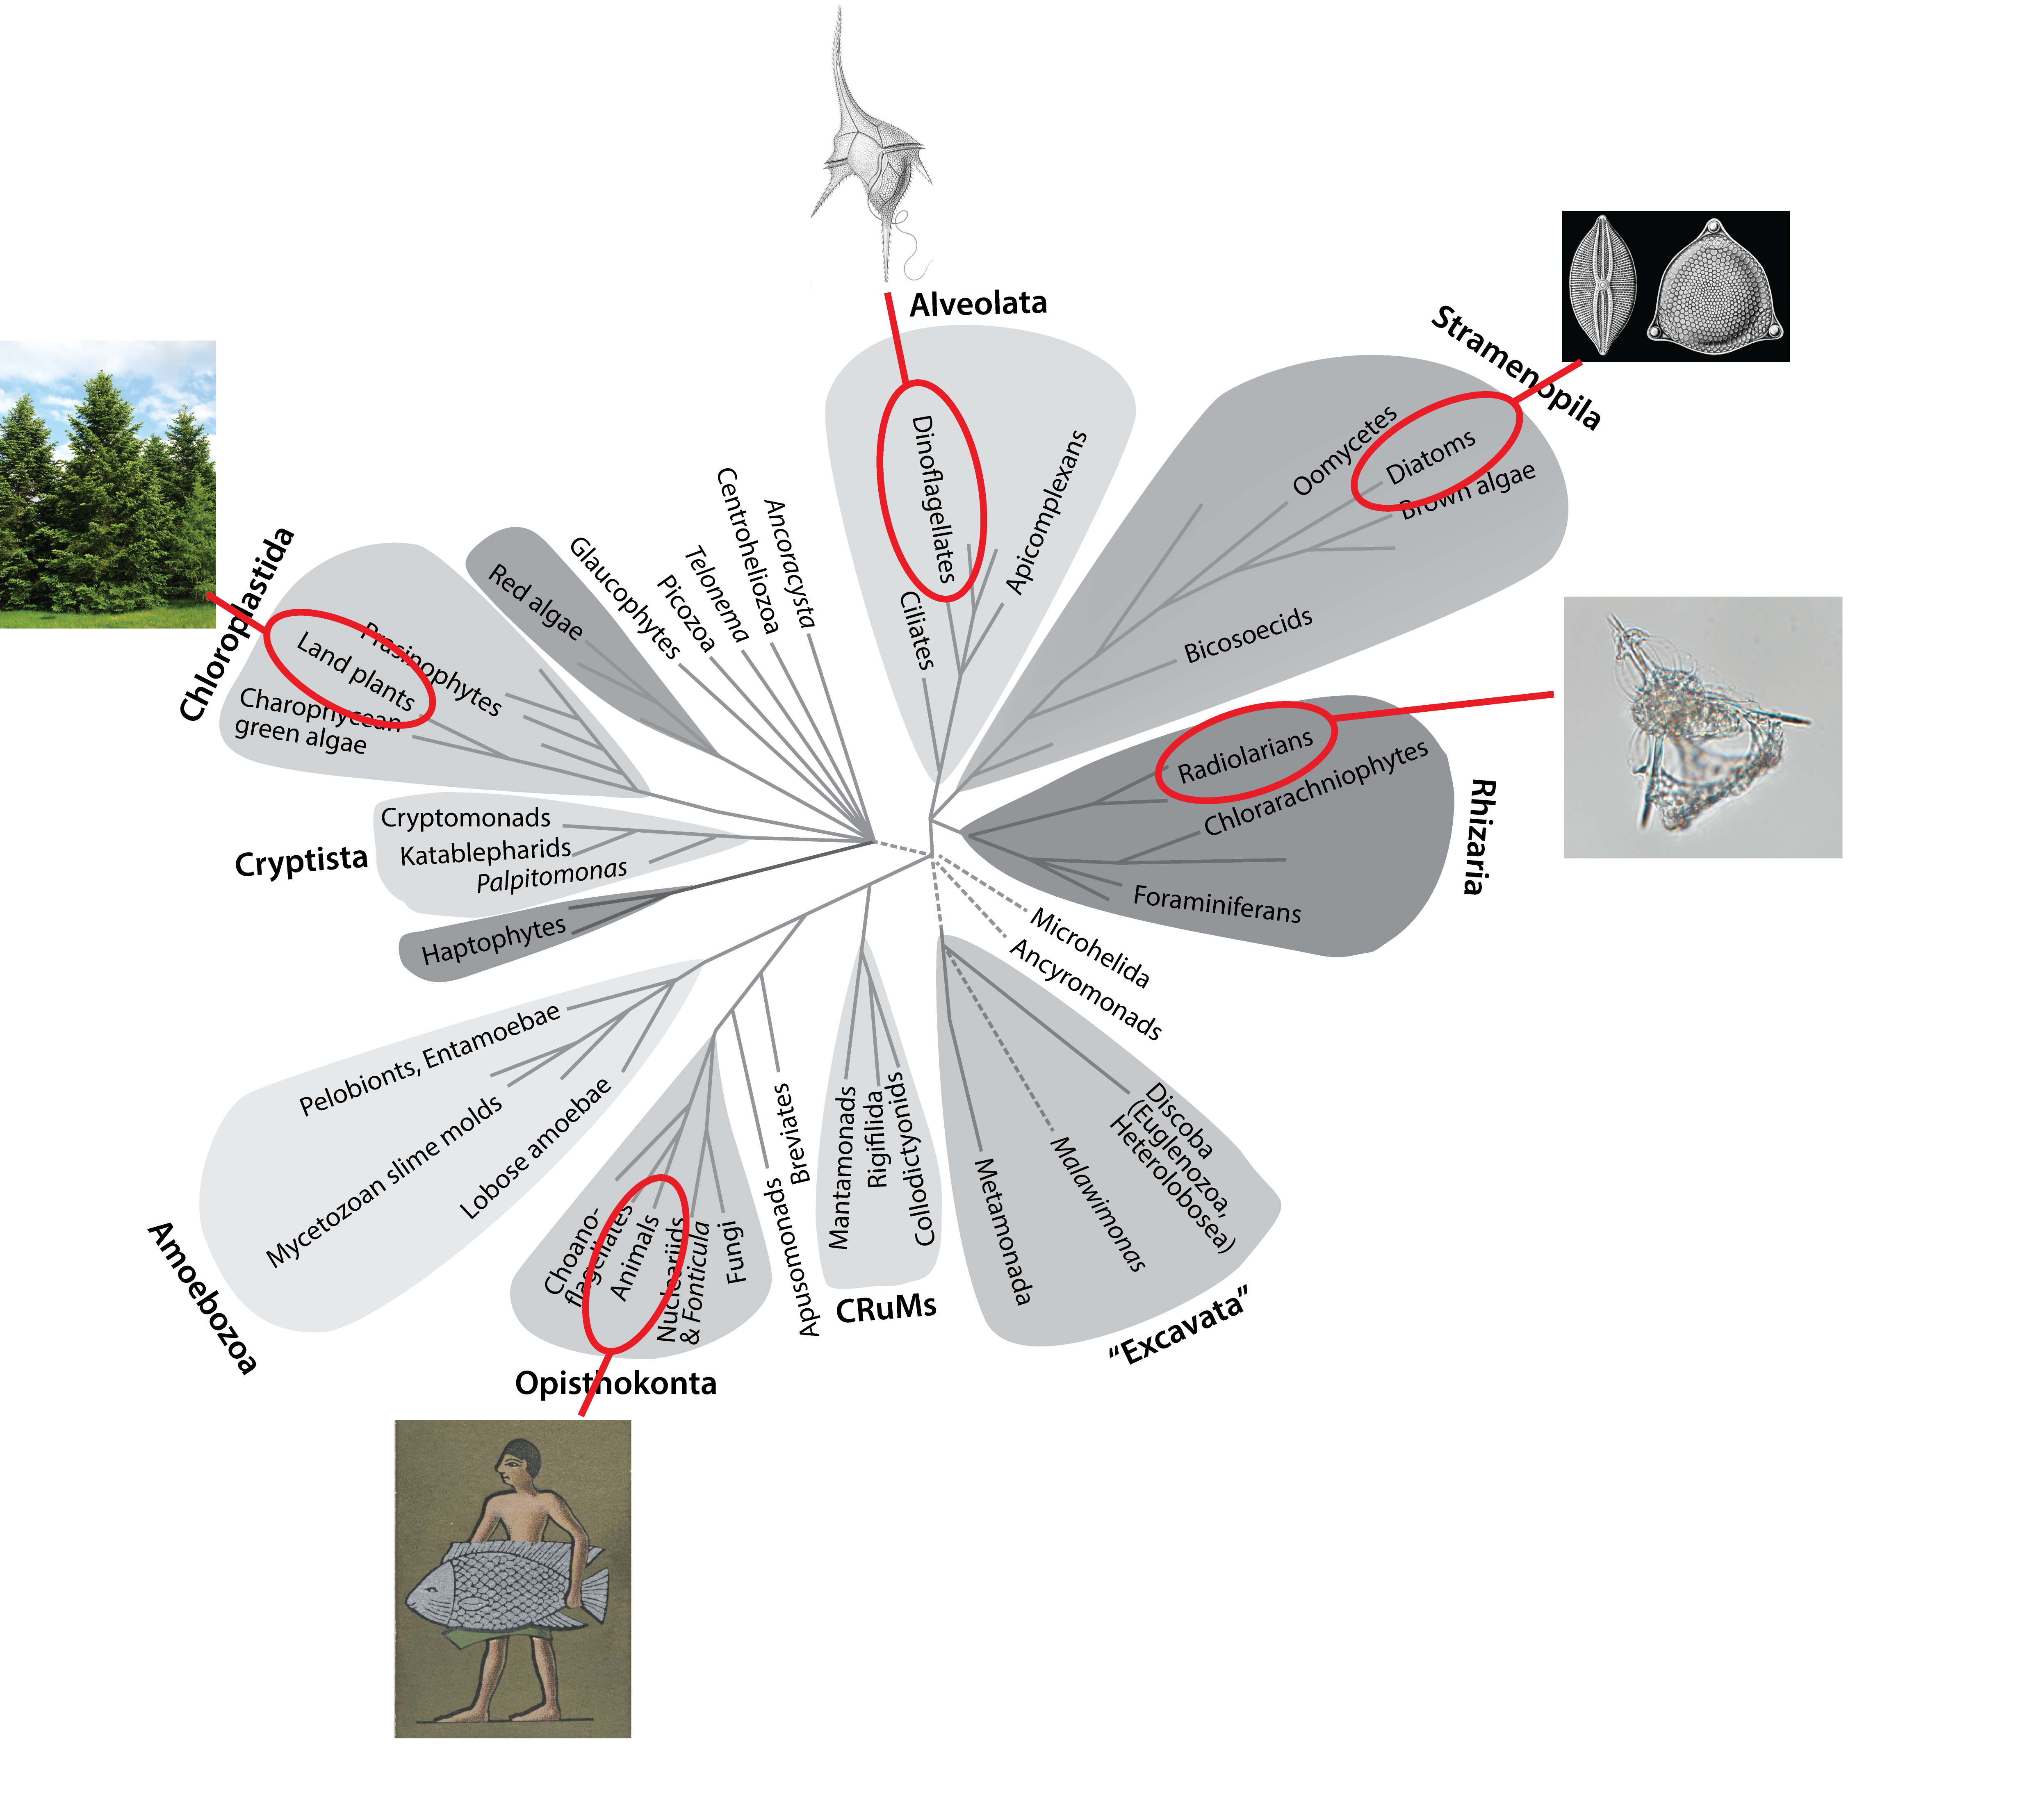 Eukaryote tree of life